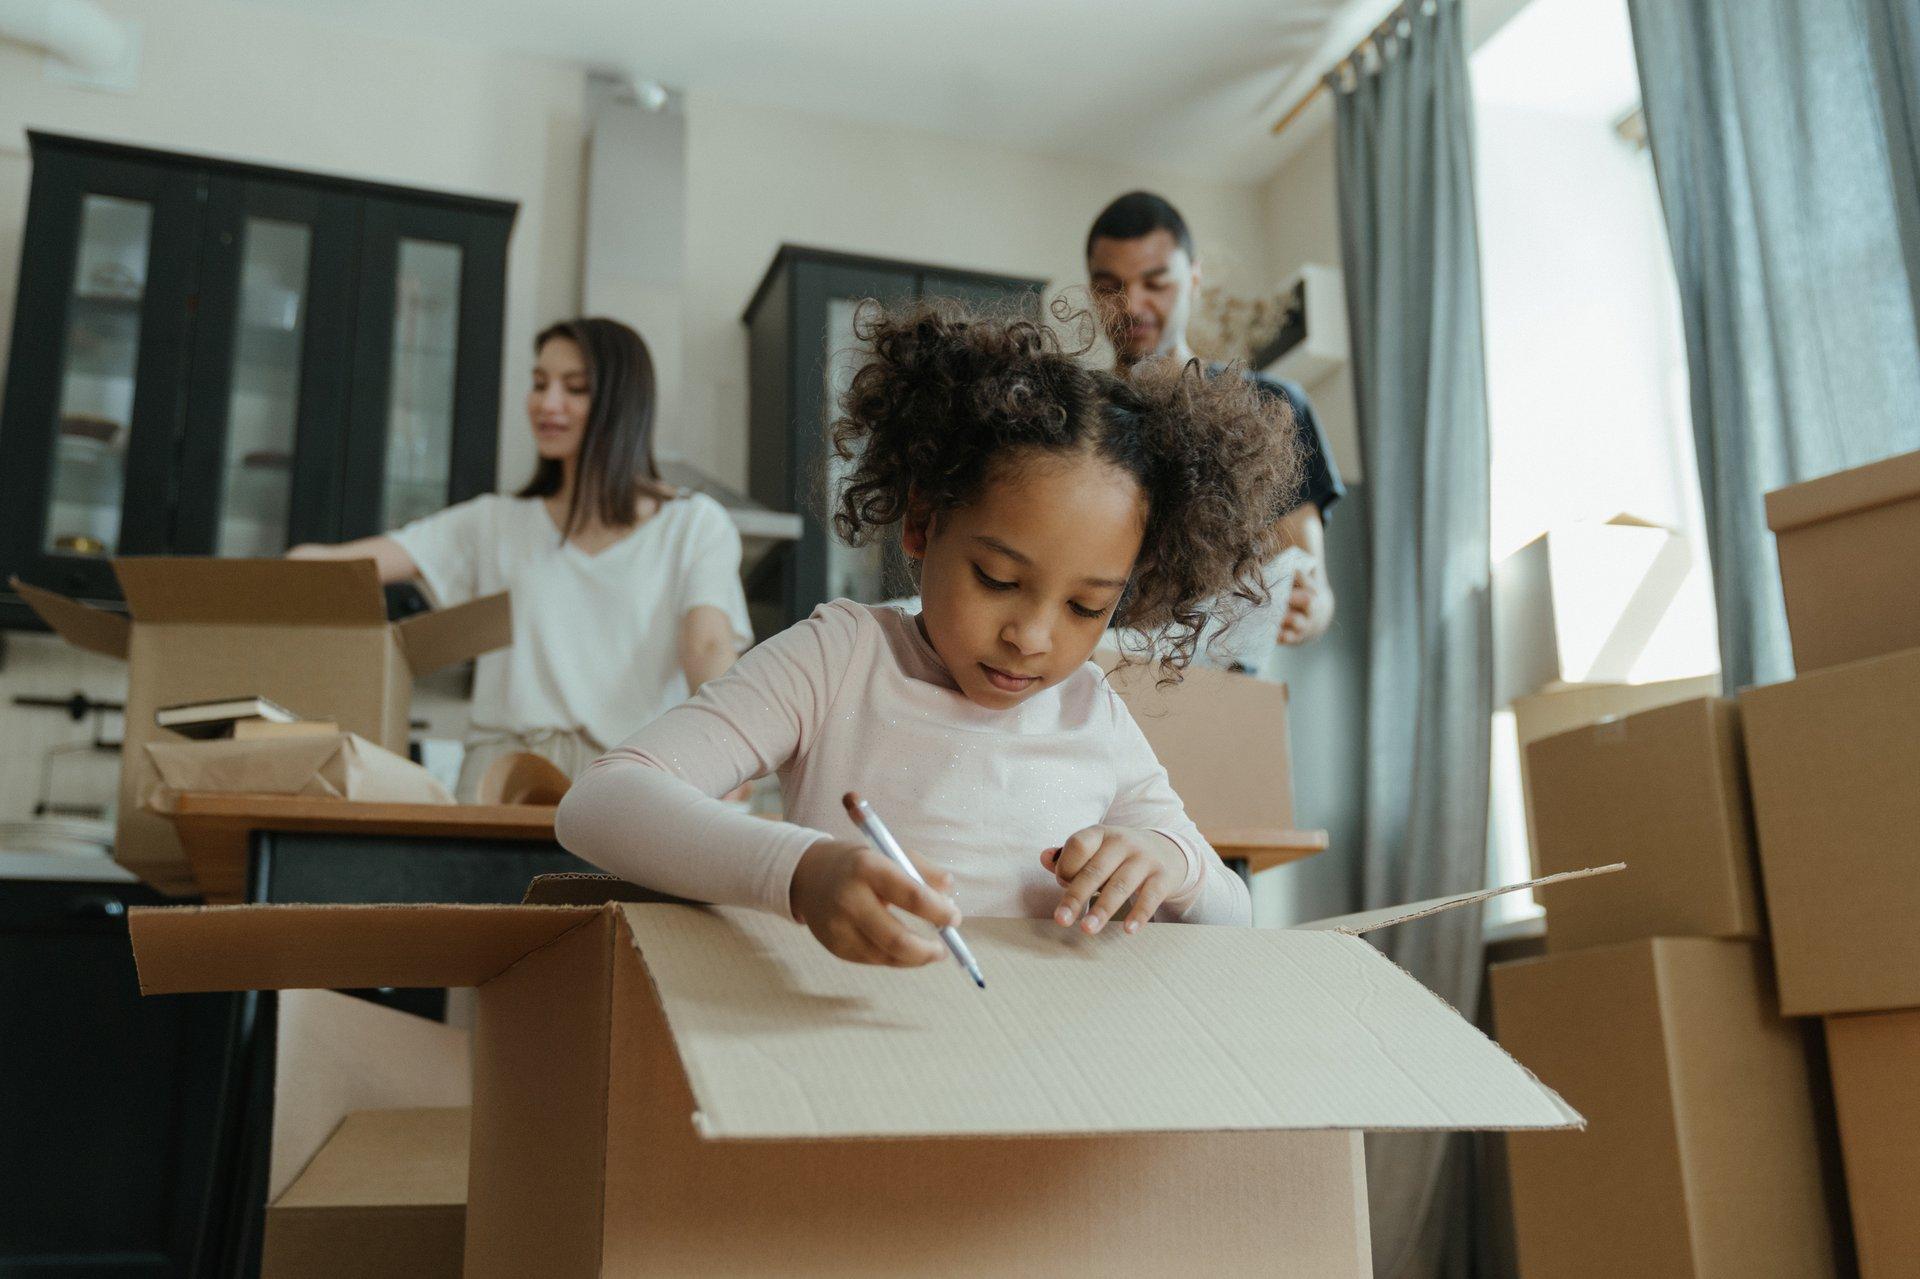 Girl in White Long Sleeve Shirt Writing on White Paper